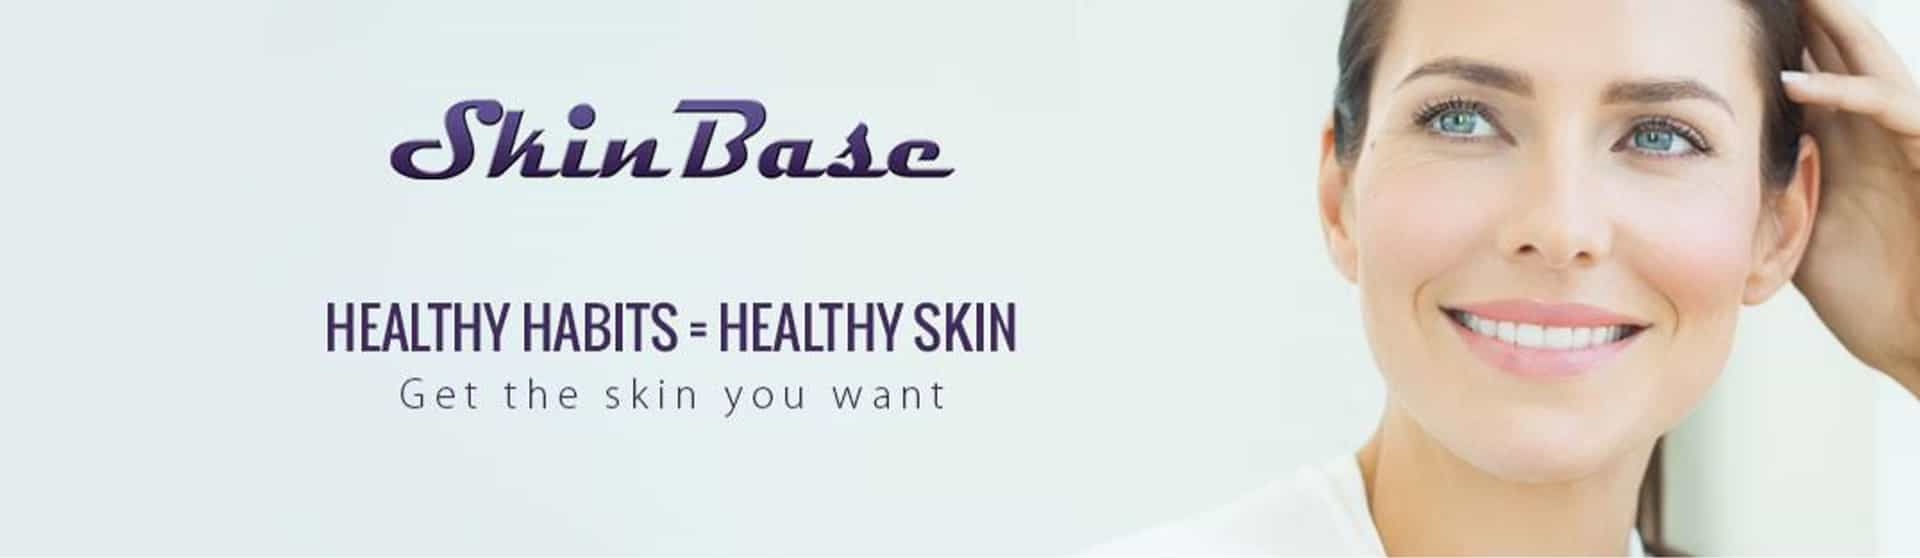 prestige skin clinic skin base banner home page